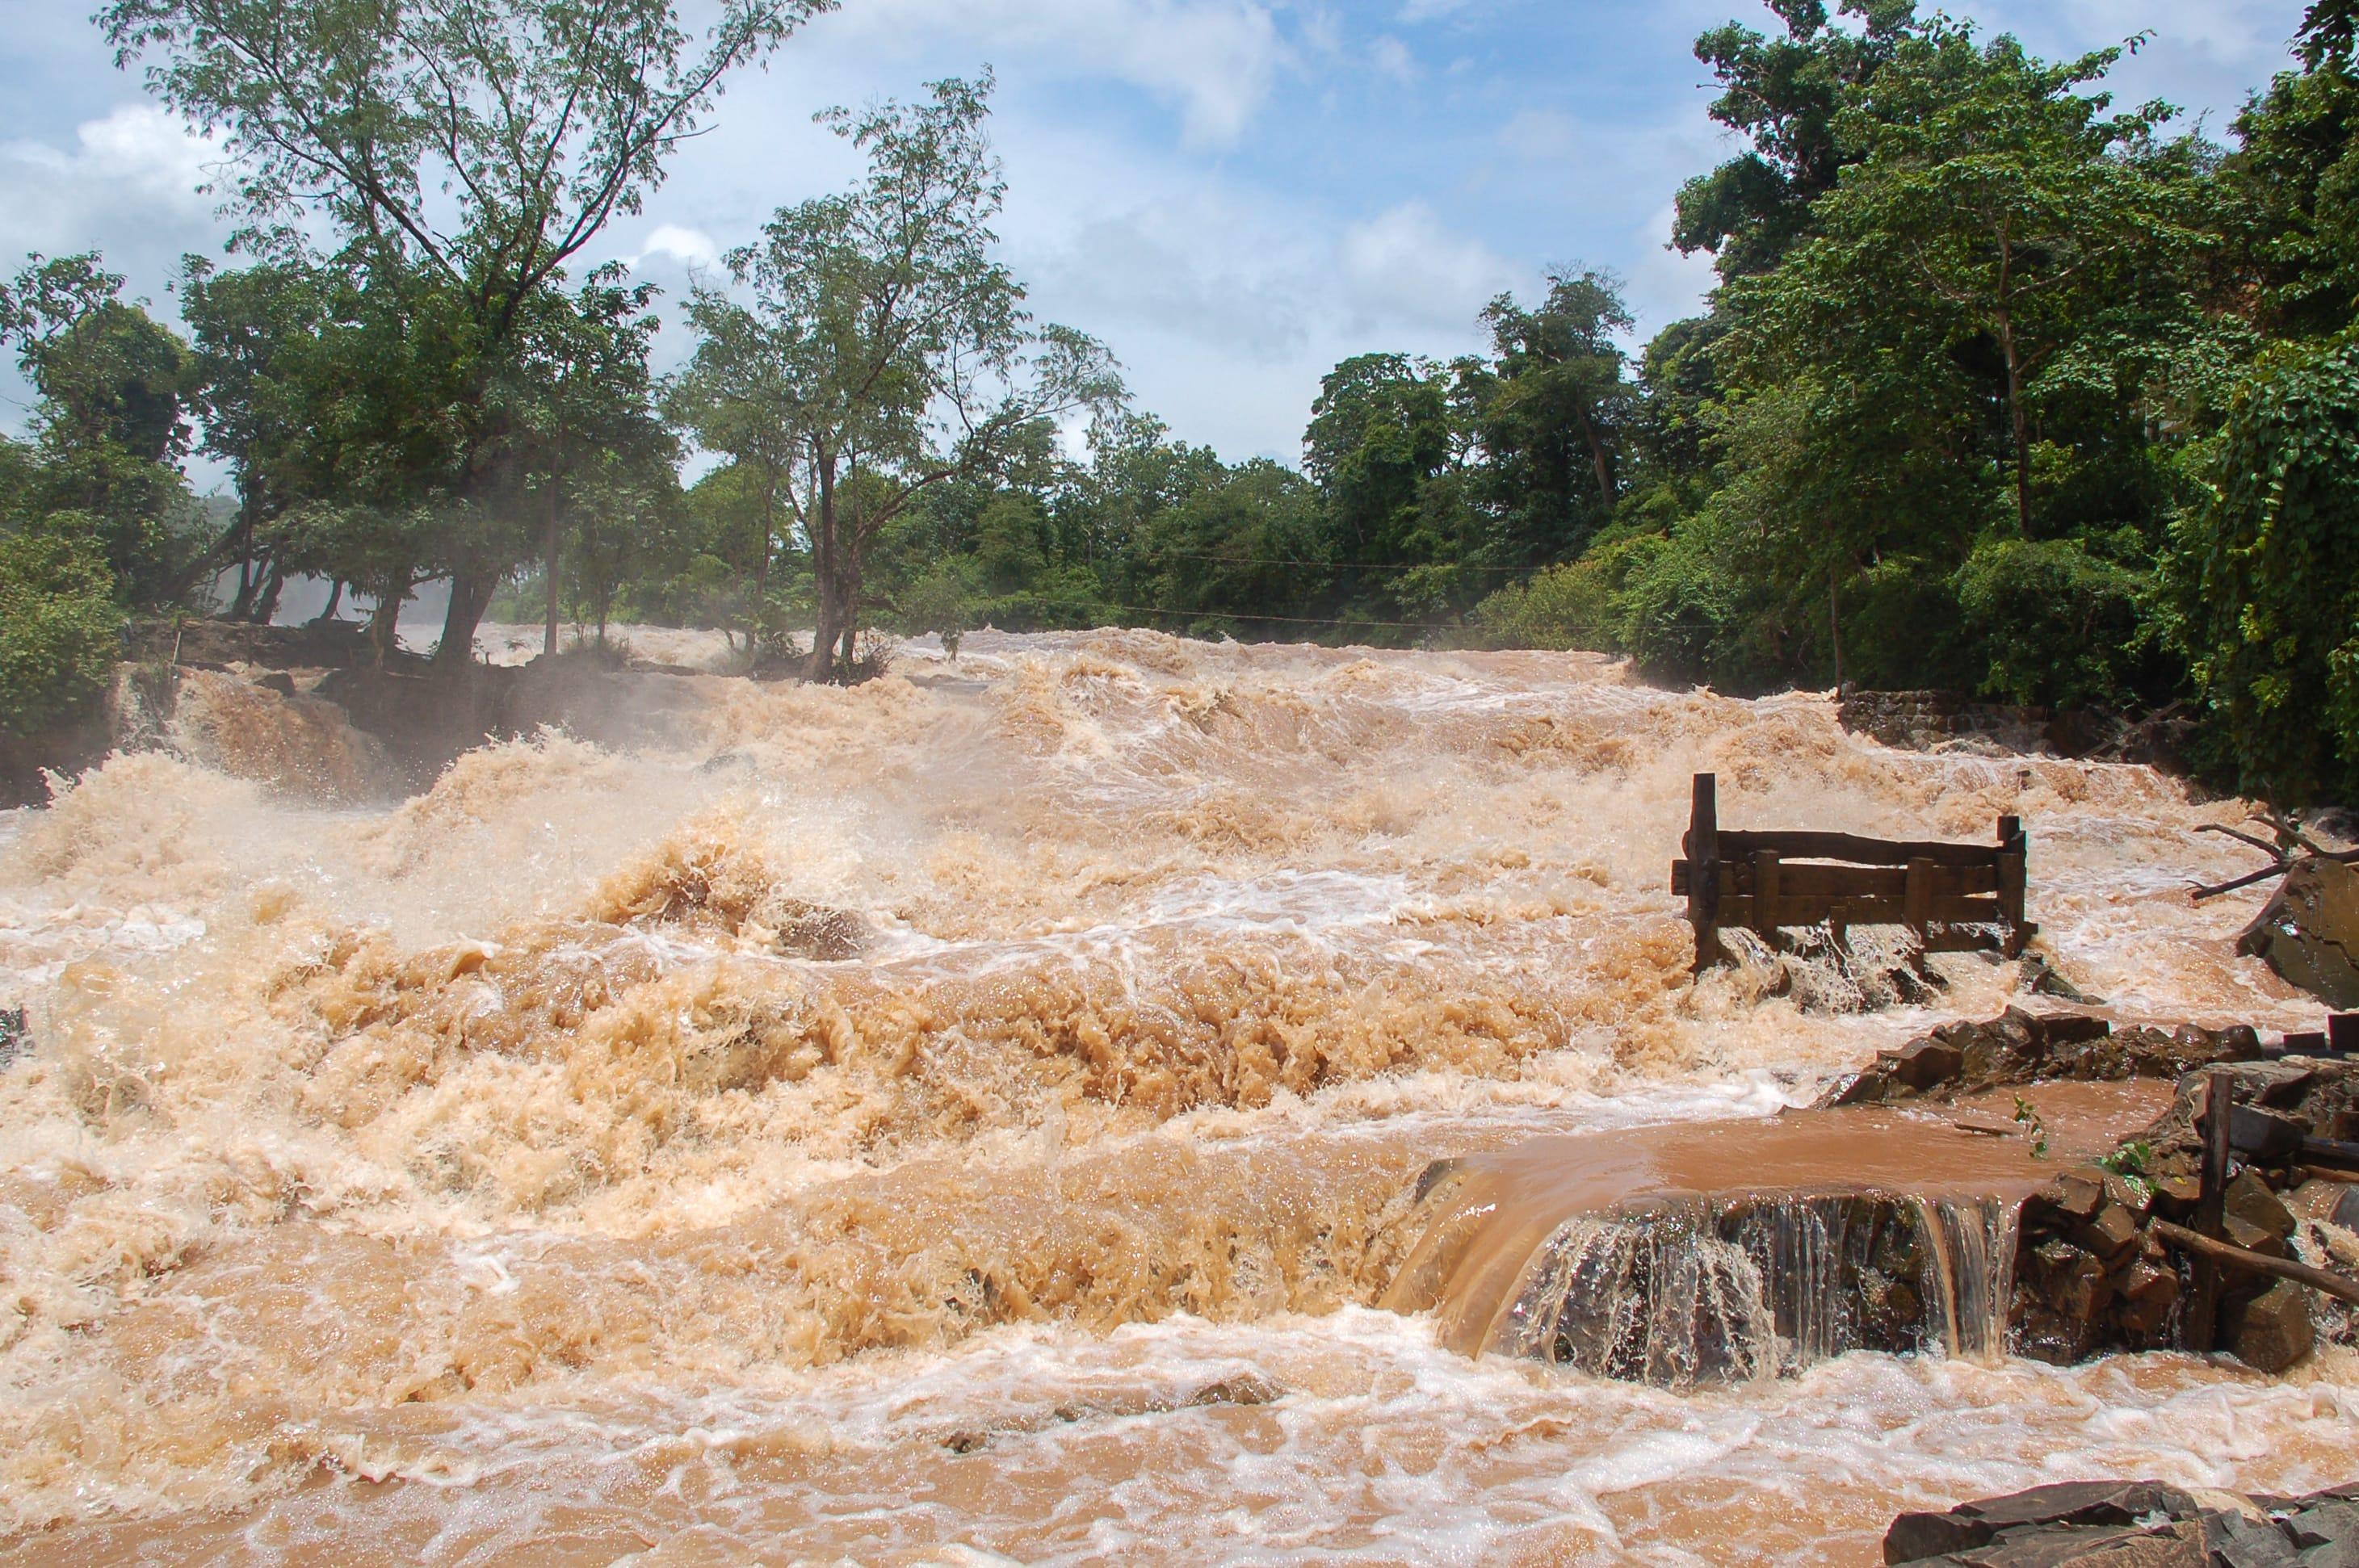 Addressing Worldwide Flood Concerns: Empowering Local Communities